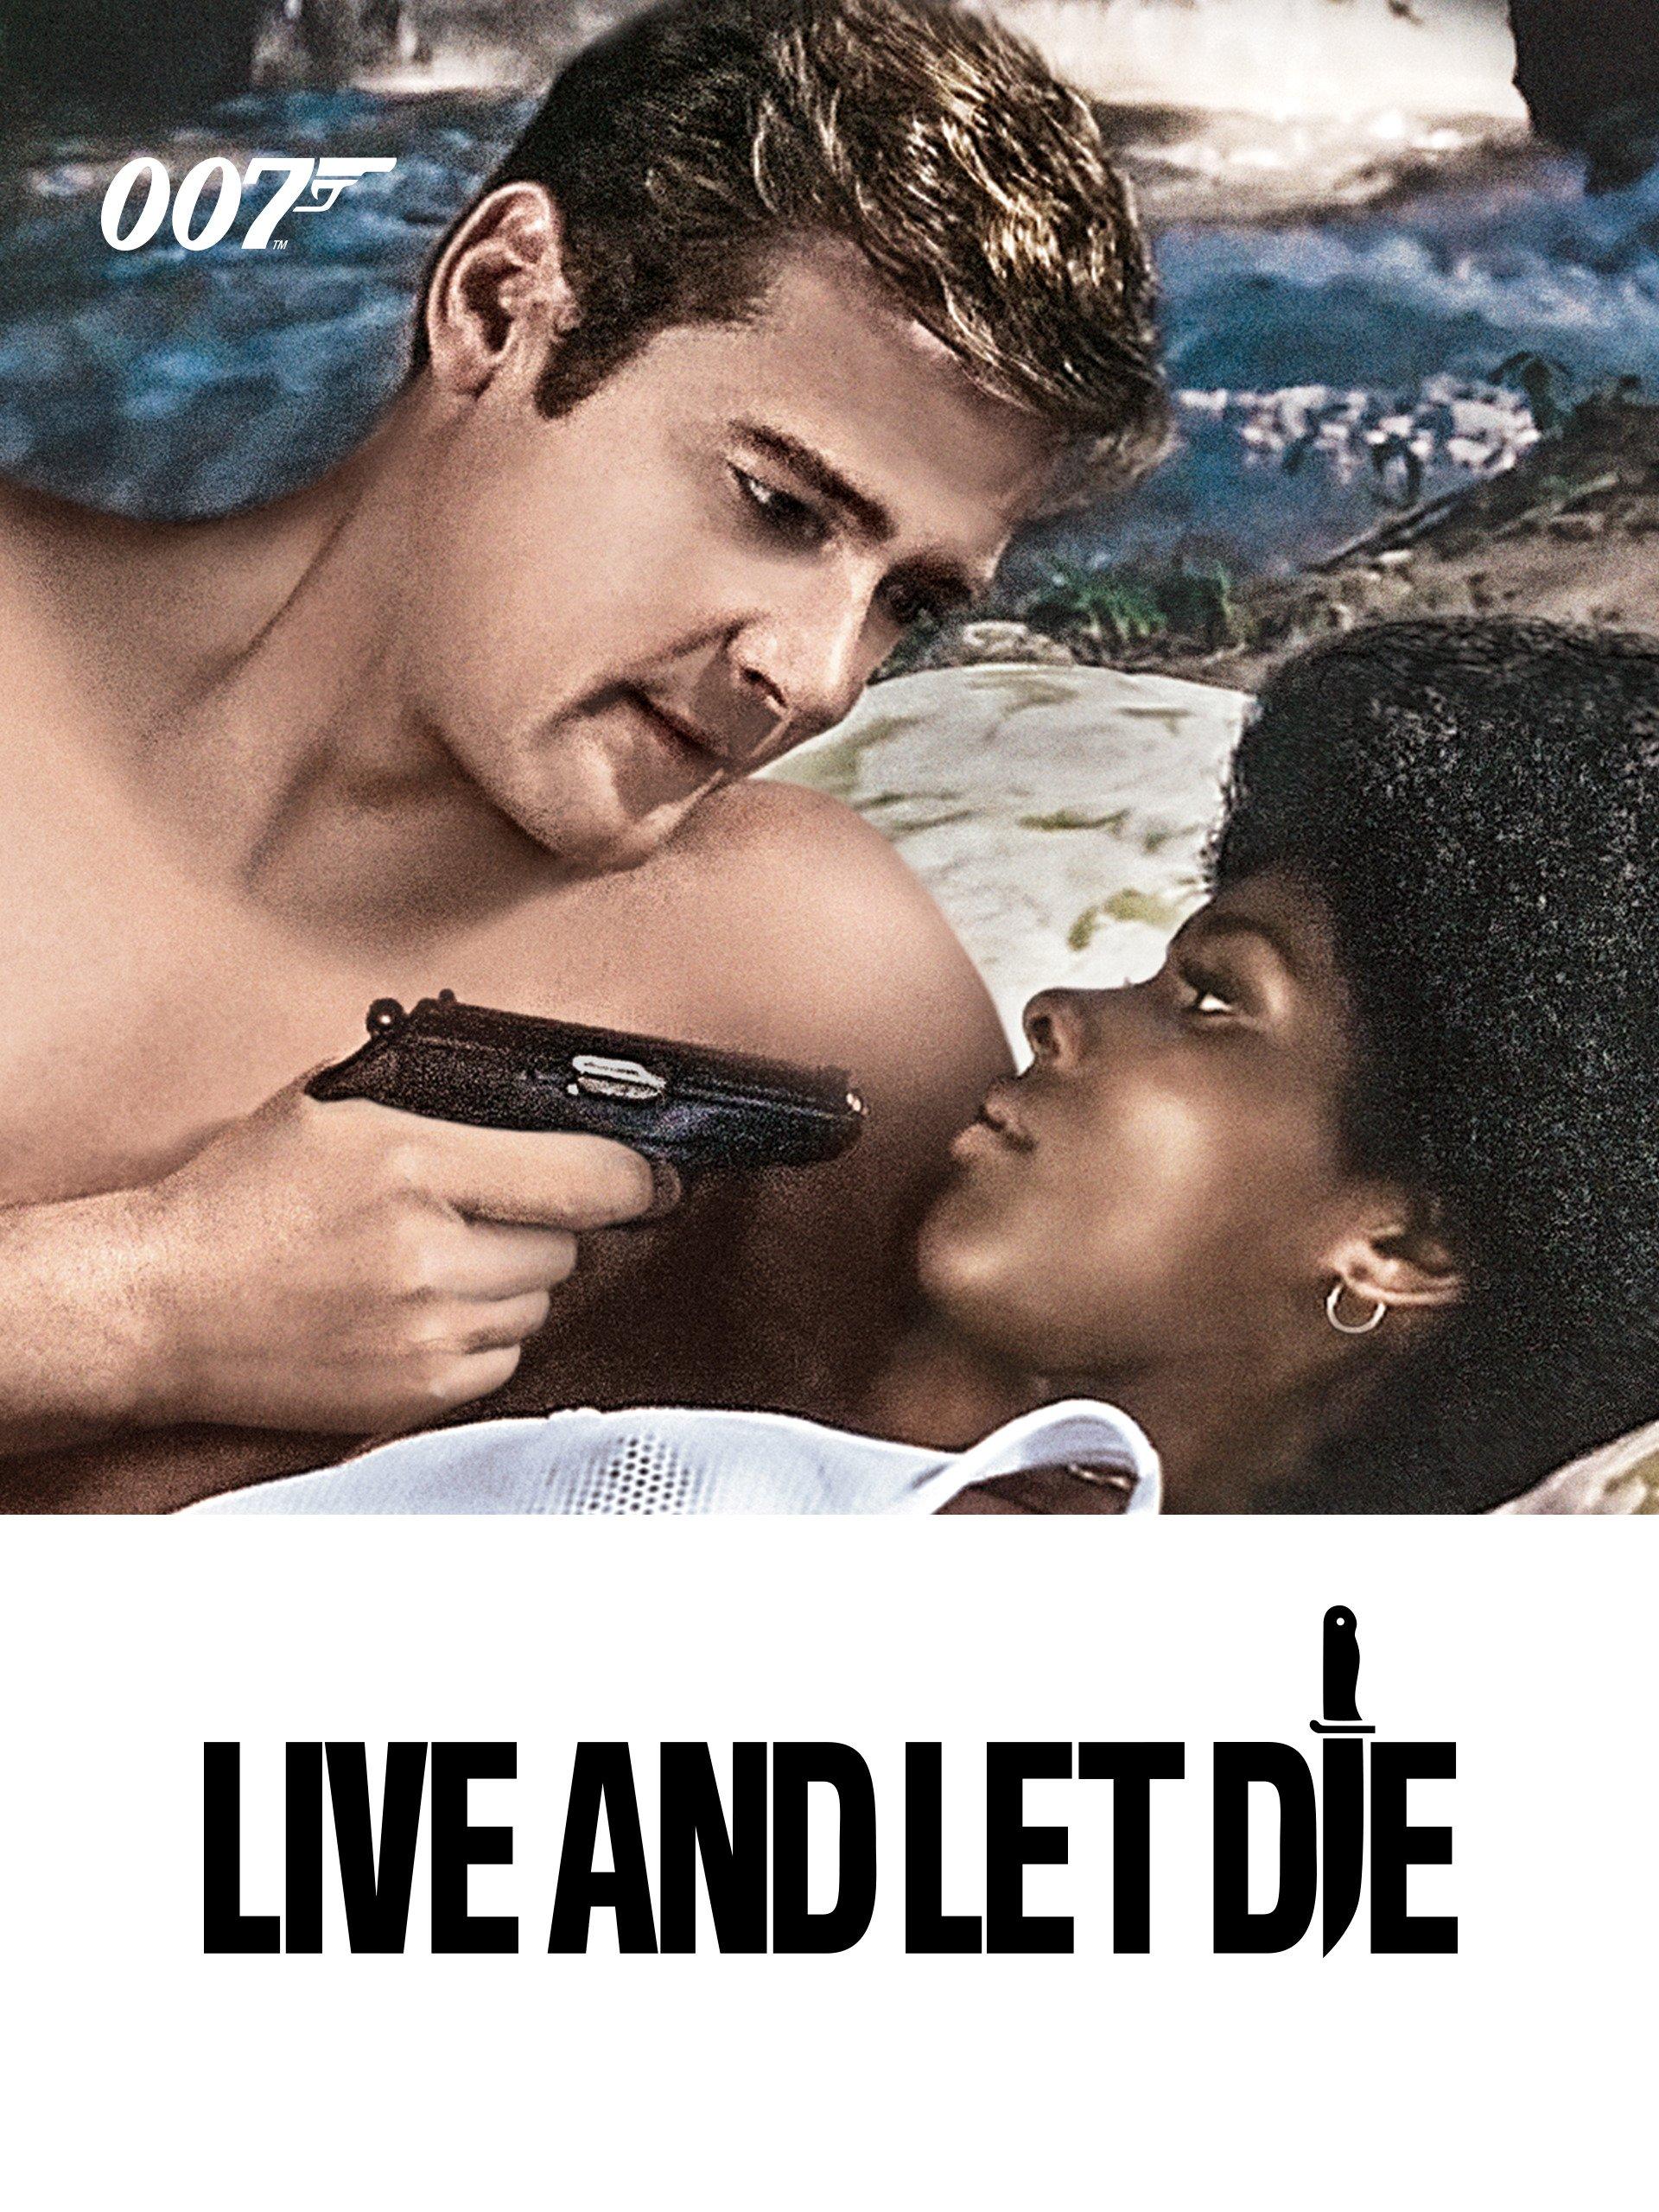 Amazon Live And Let Die Roger Moore James Bond Jane Seymour Solitaire Simone Latrelle Yaphet Kotto Kananga Mr Big Clifton Sheriff